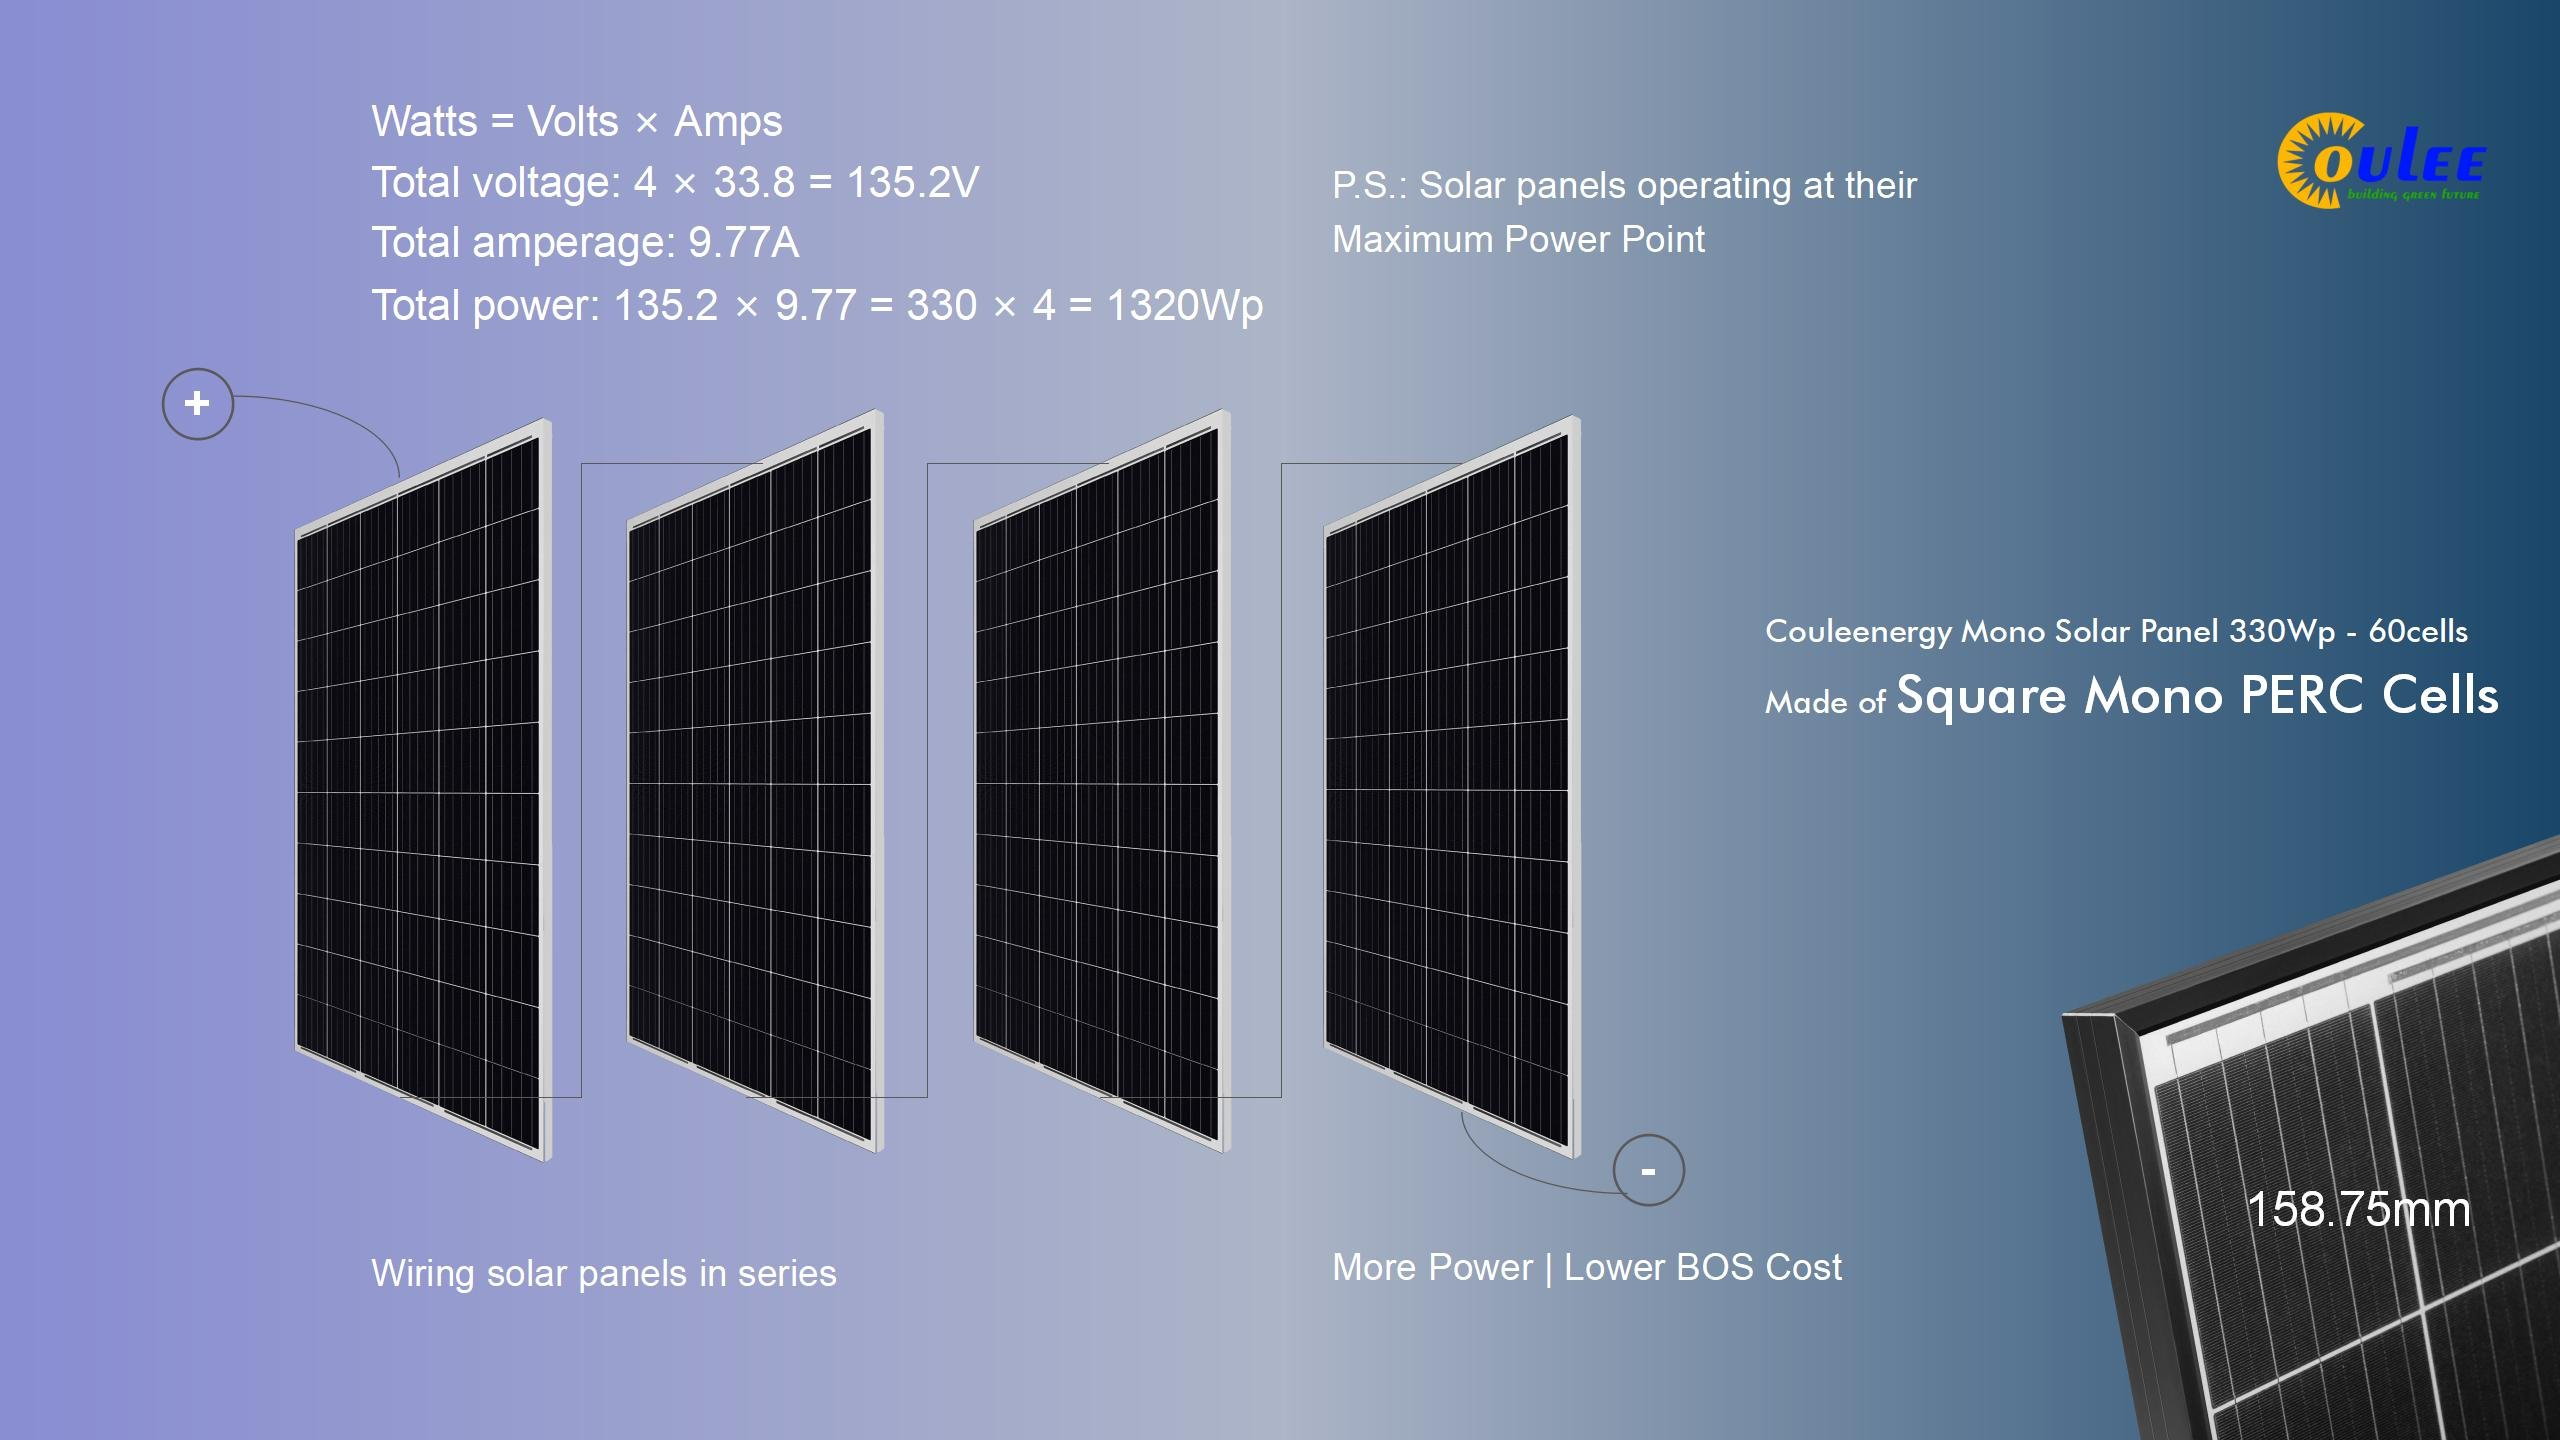 Solar Panels In Series, Couleenergy Mono Solar Panel